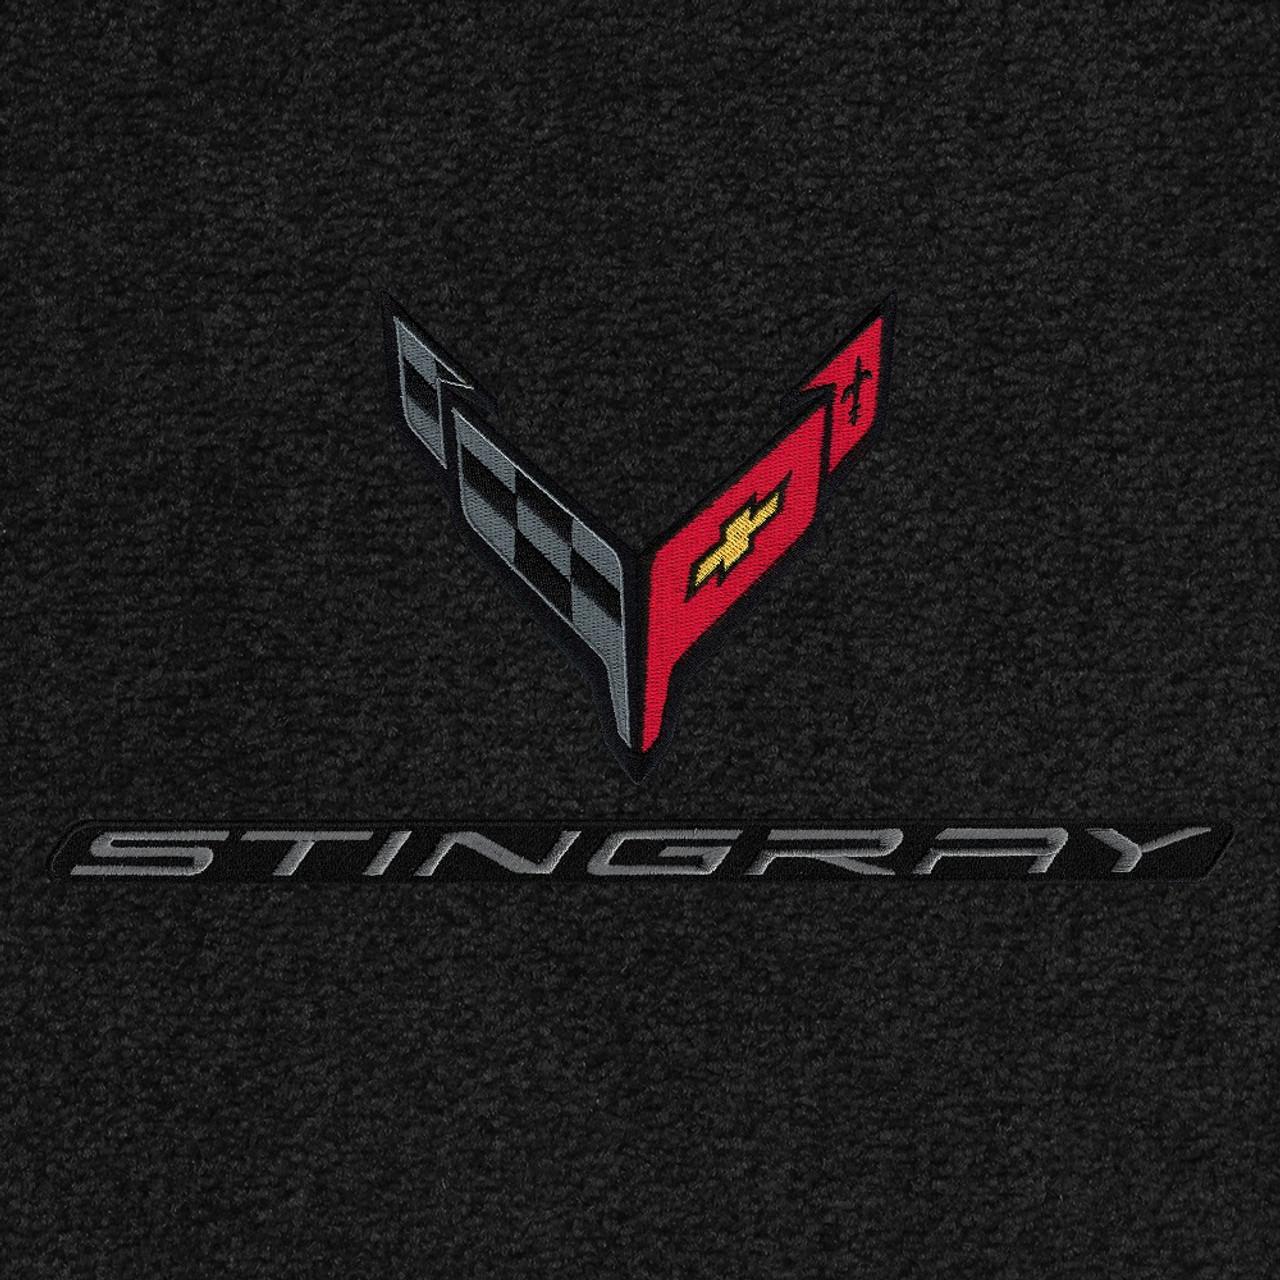 819413 - C8 Logo Carbon & Stingray Word Carbon